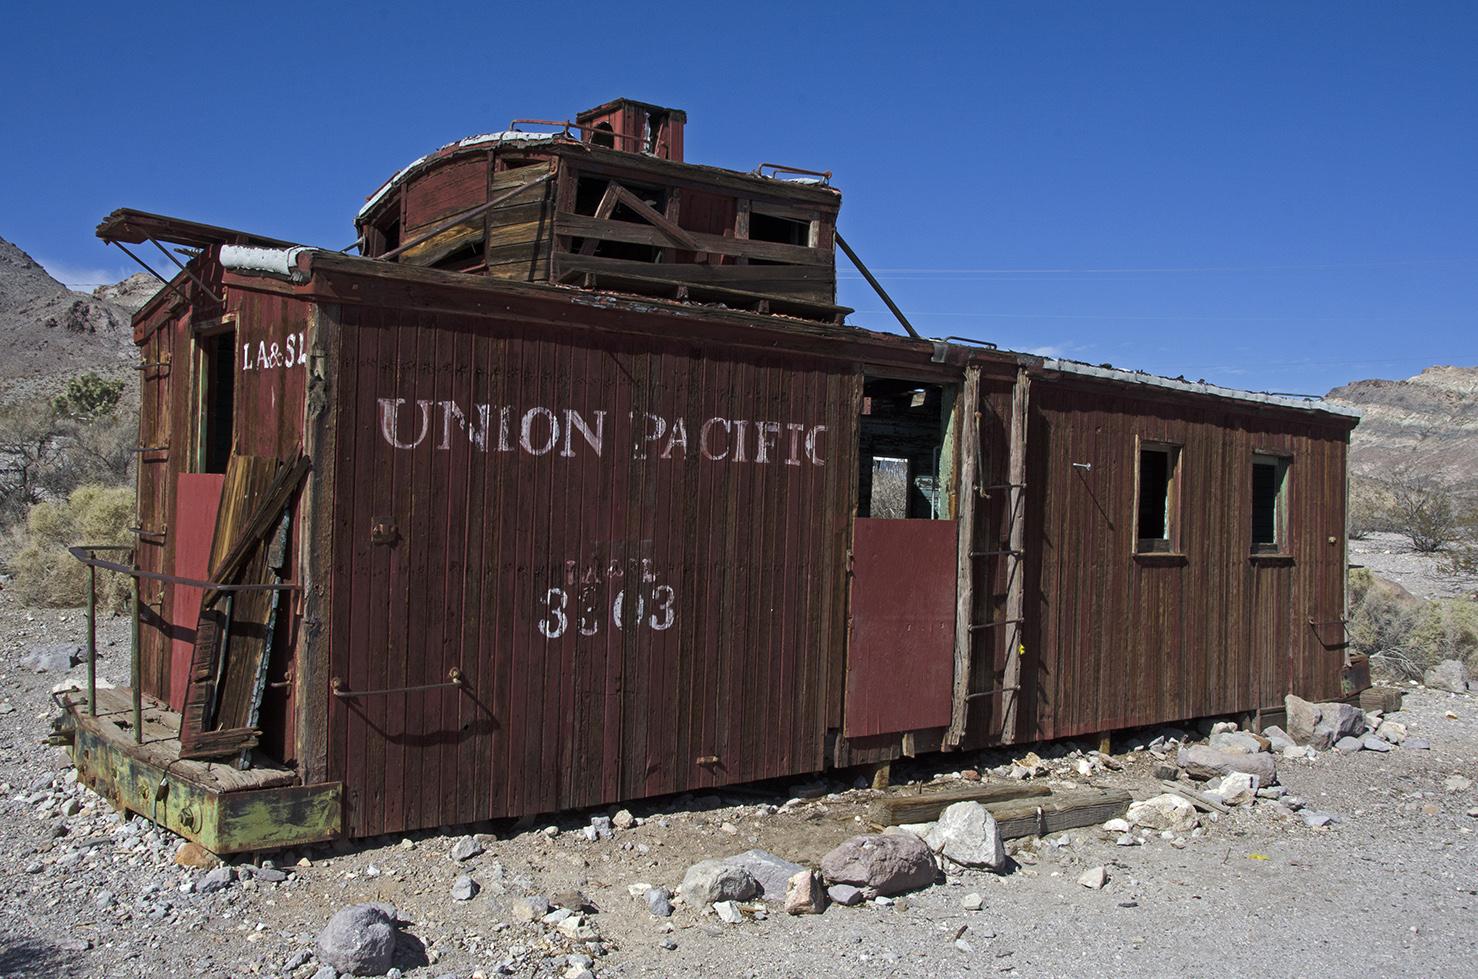 An old caboose near the train depot.